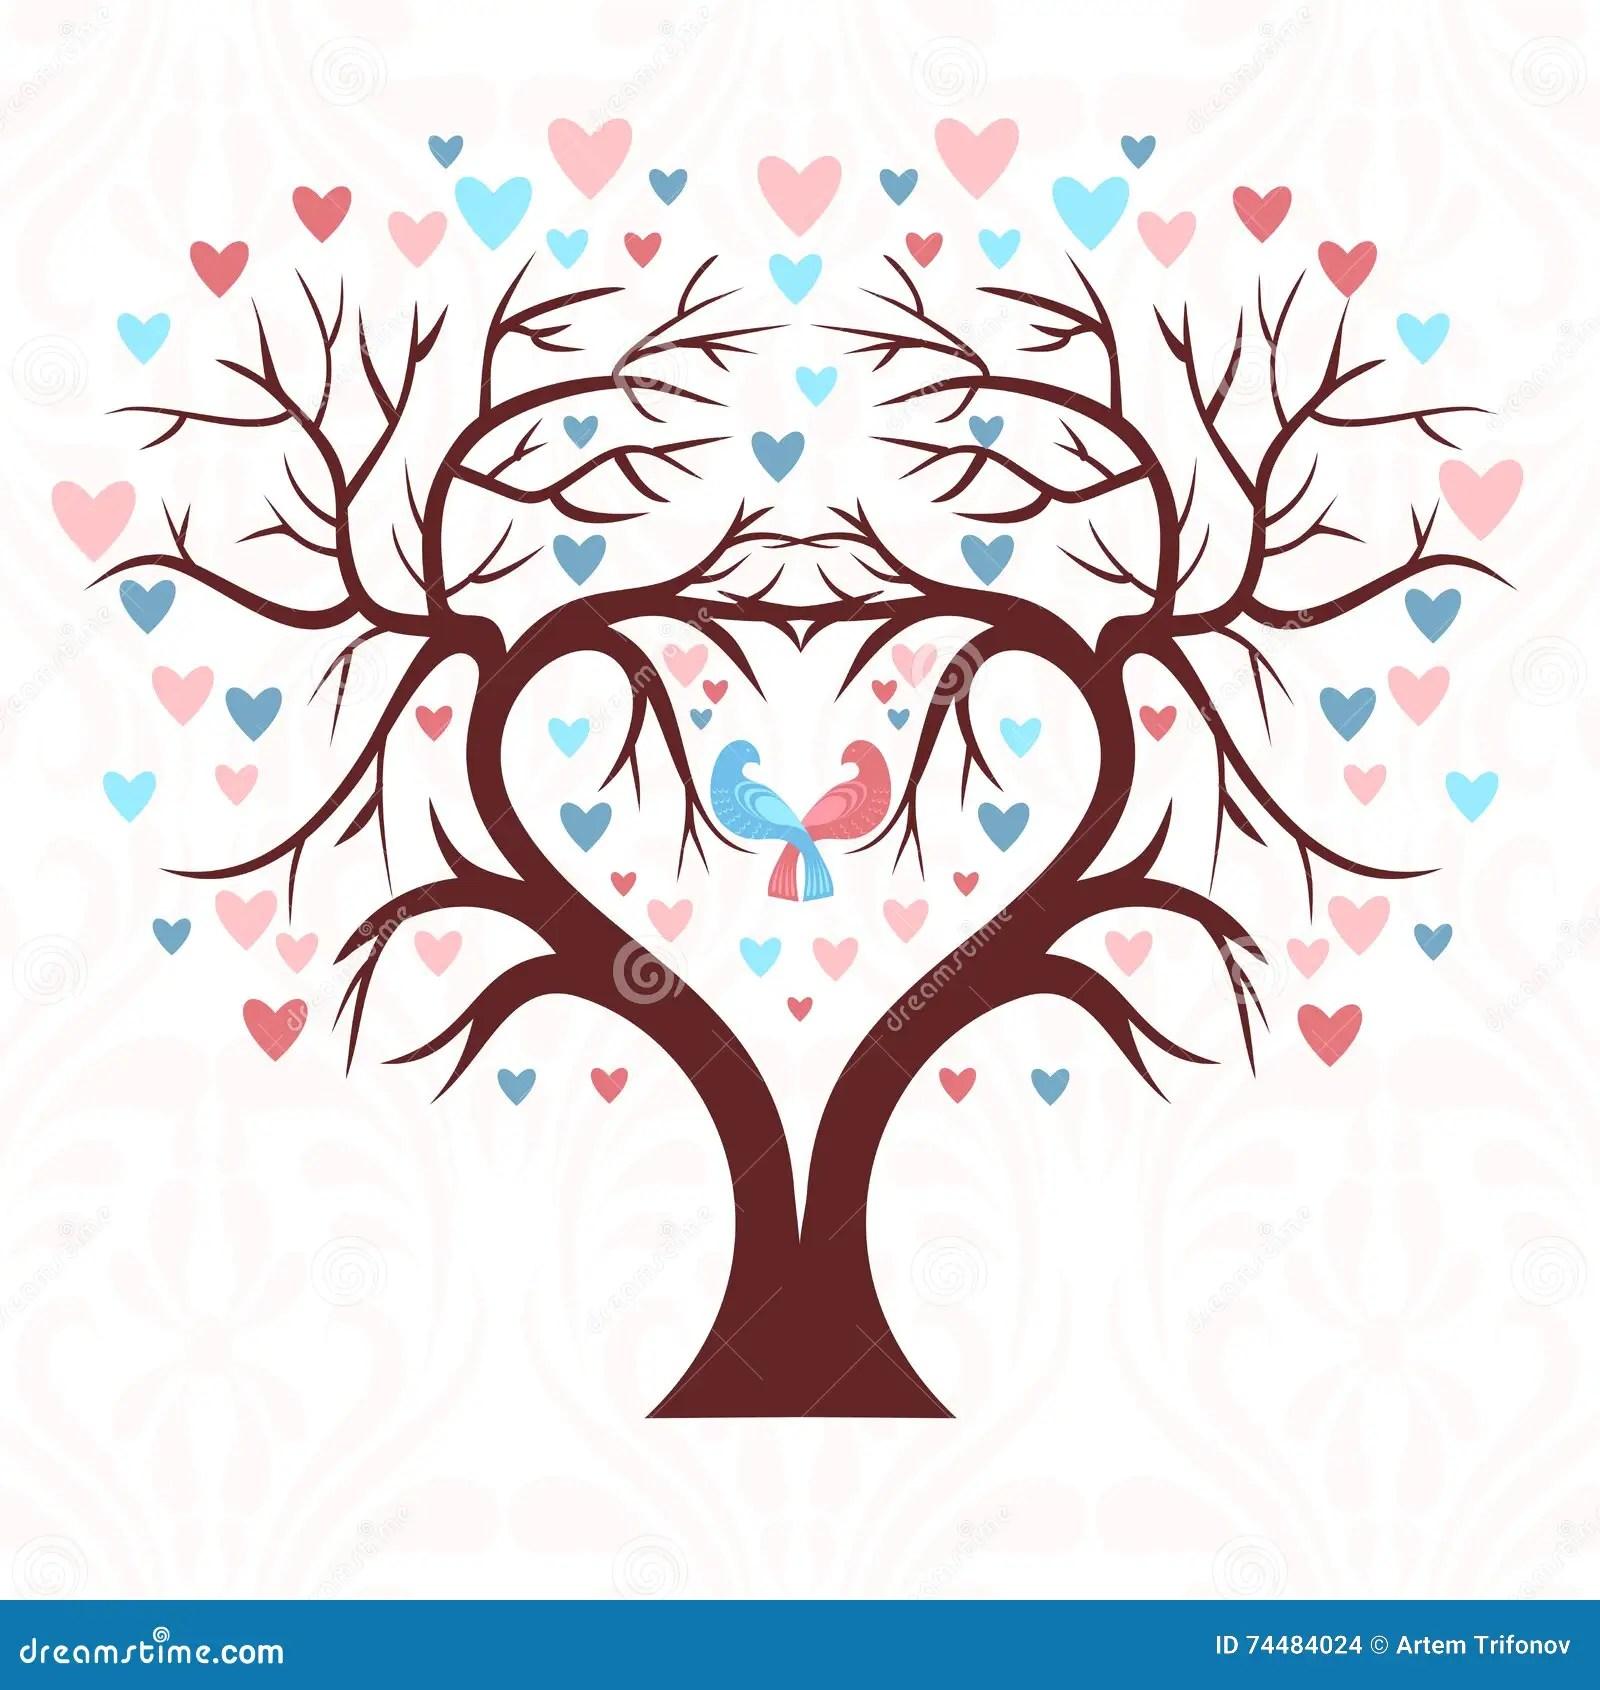 stock illustration wedding tree shape heart two birds colorful hearts image wedding tree The wedding tree in the shape of a heart with two birds